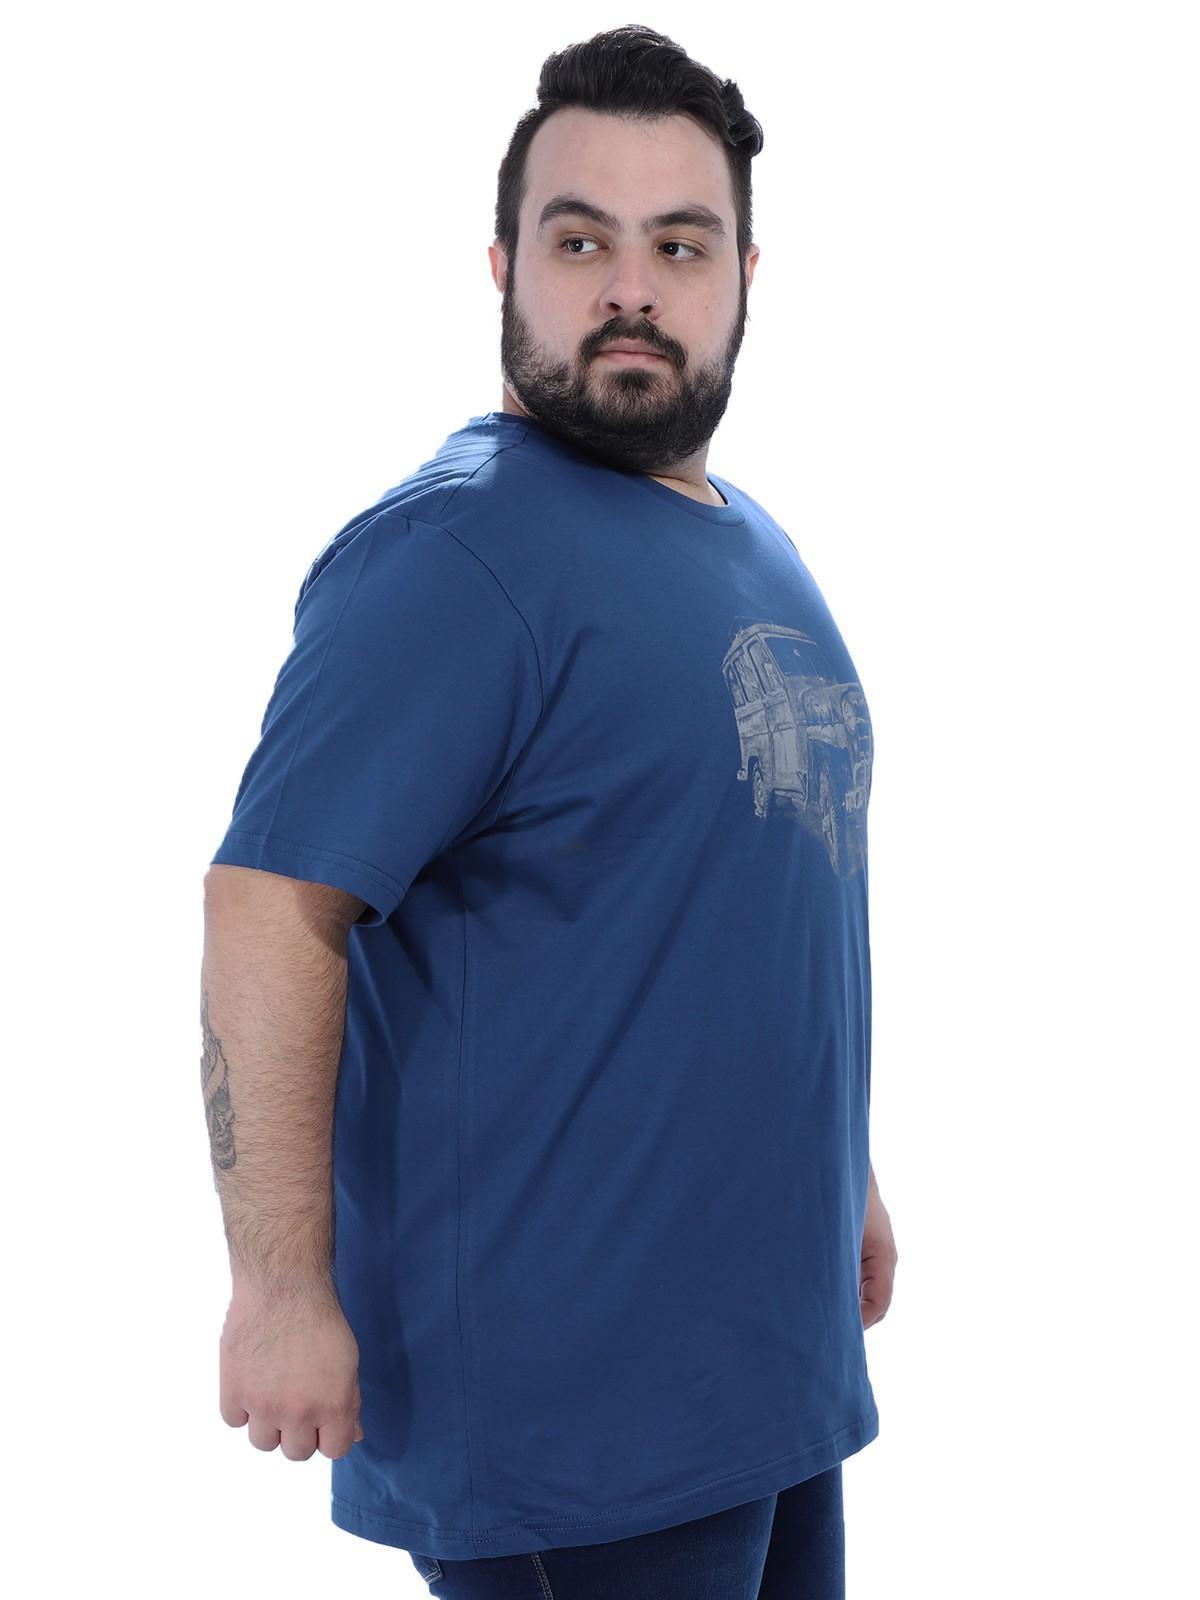 Camiseta Plus Size Masculino Jeep Anistia Azul Jeans